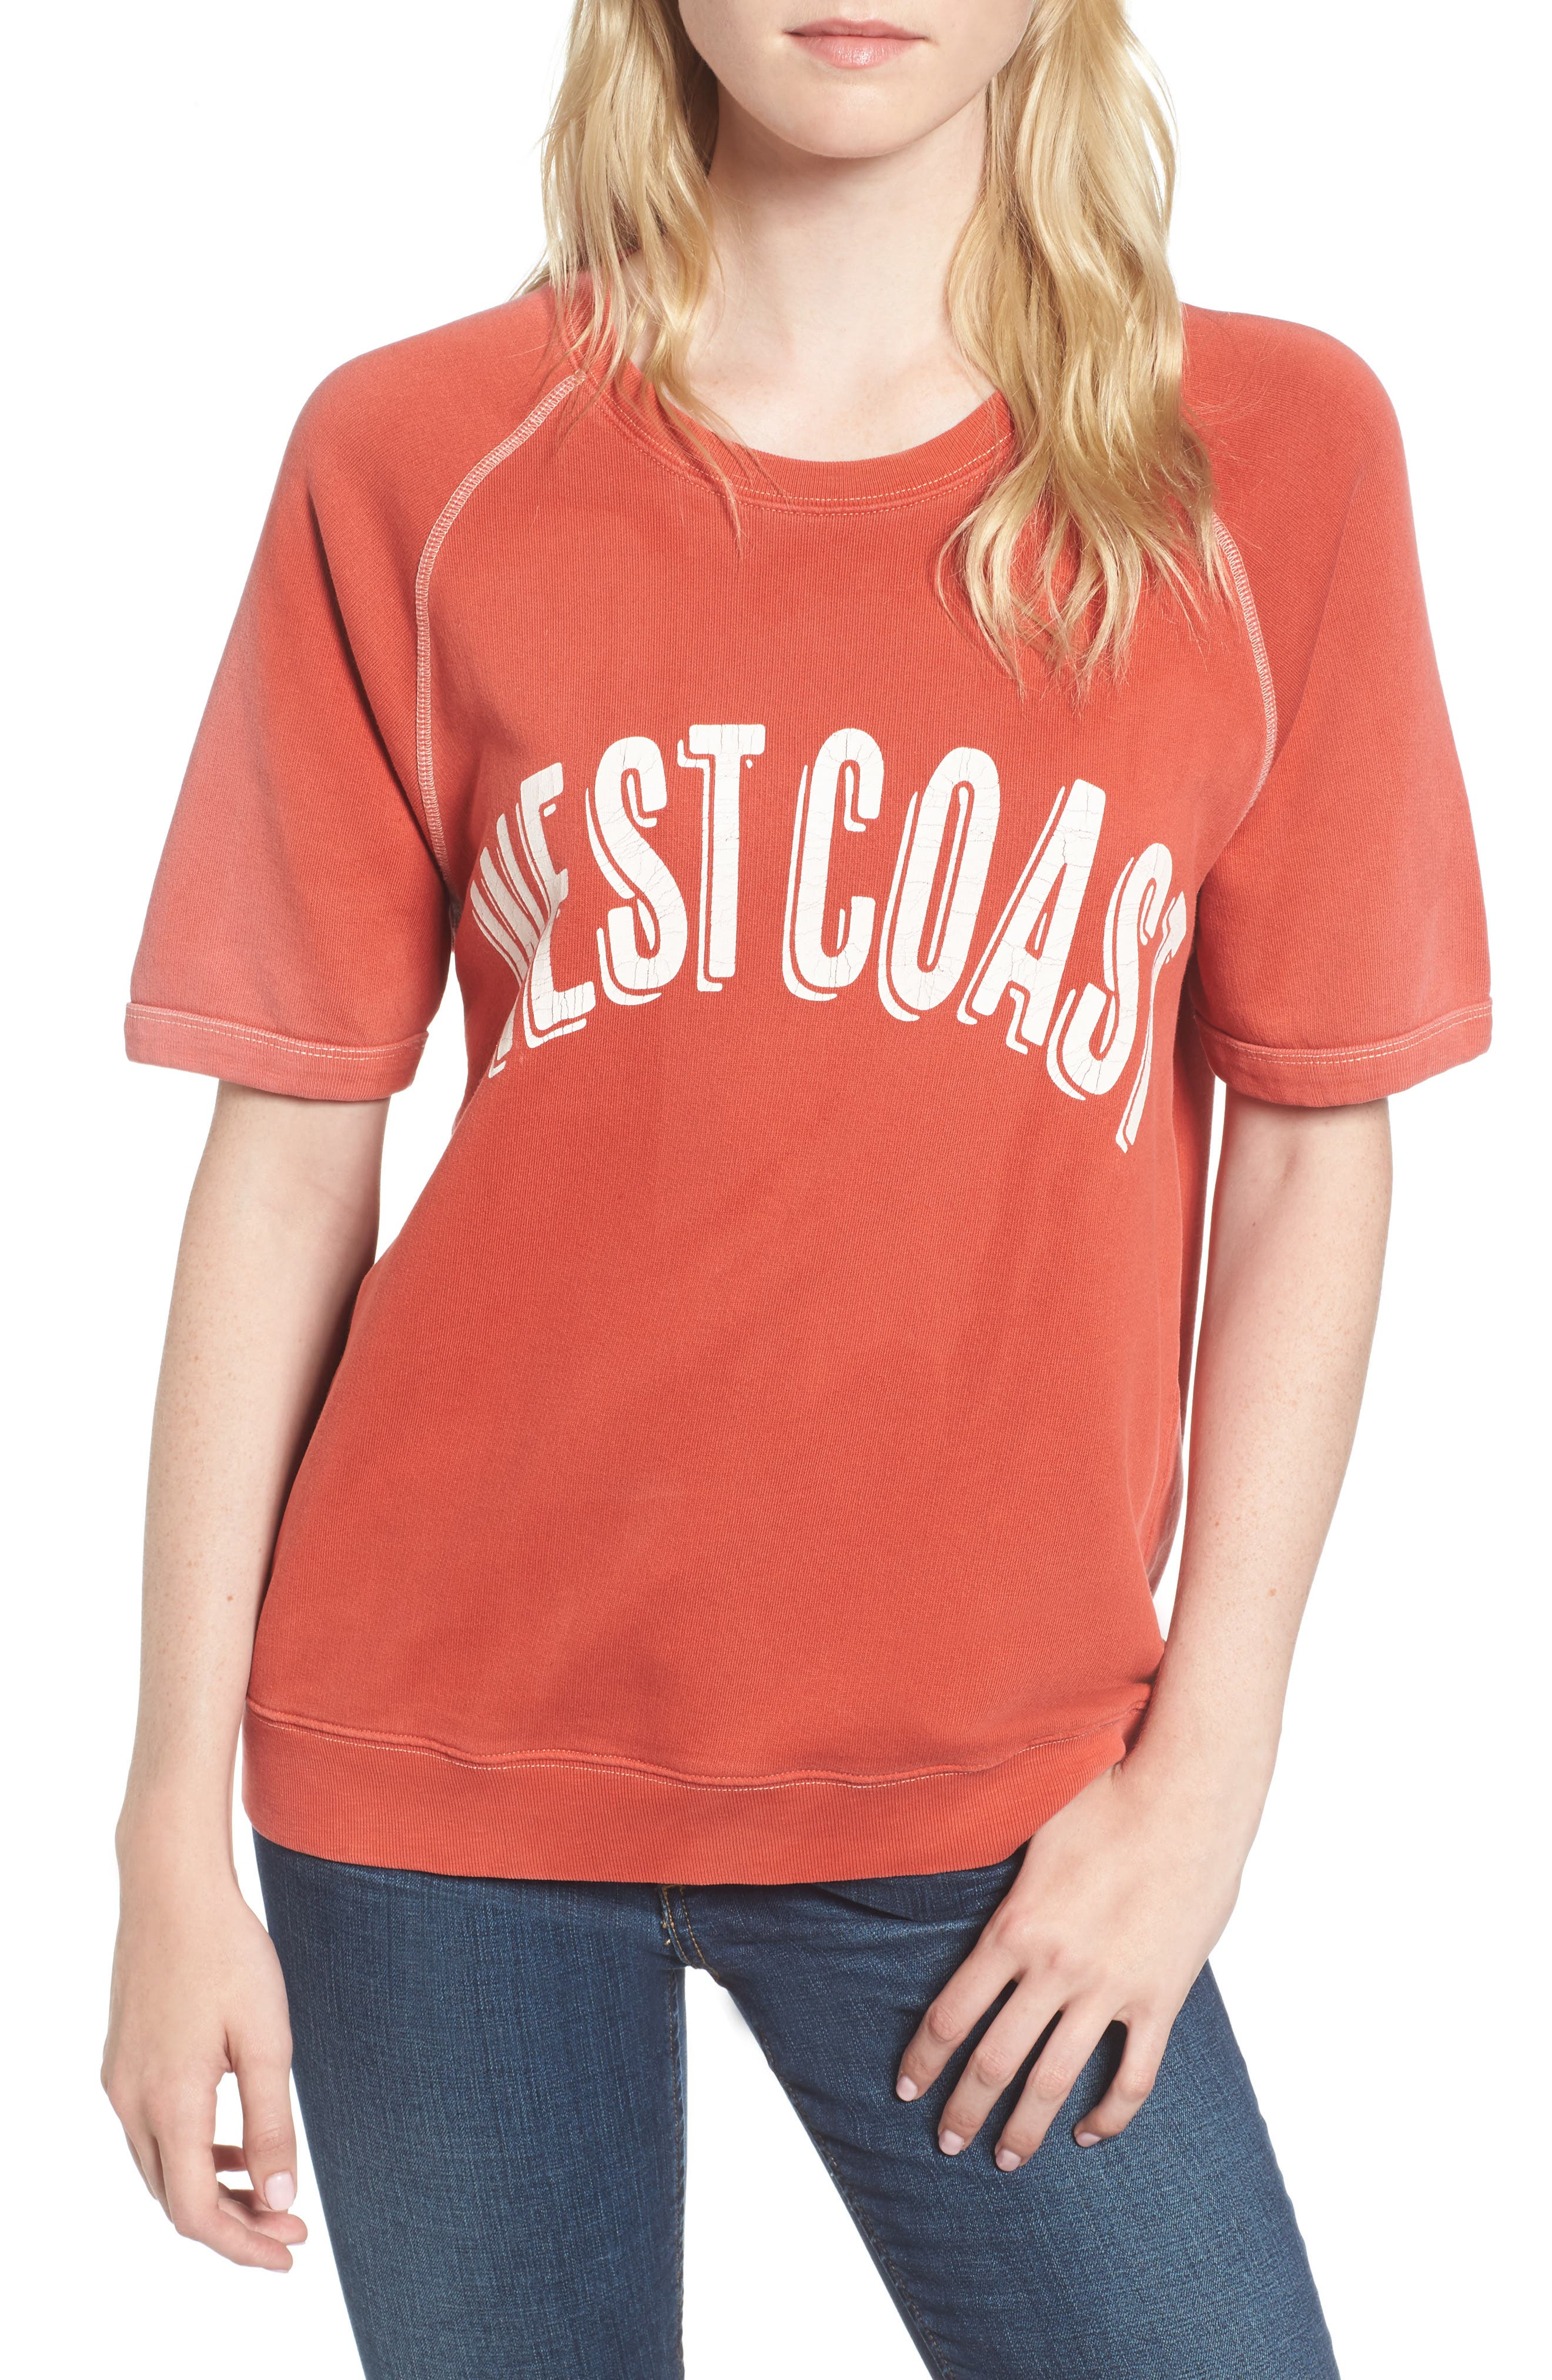 West Coast Sweatshirt,                         Main,                         color, 600